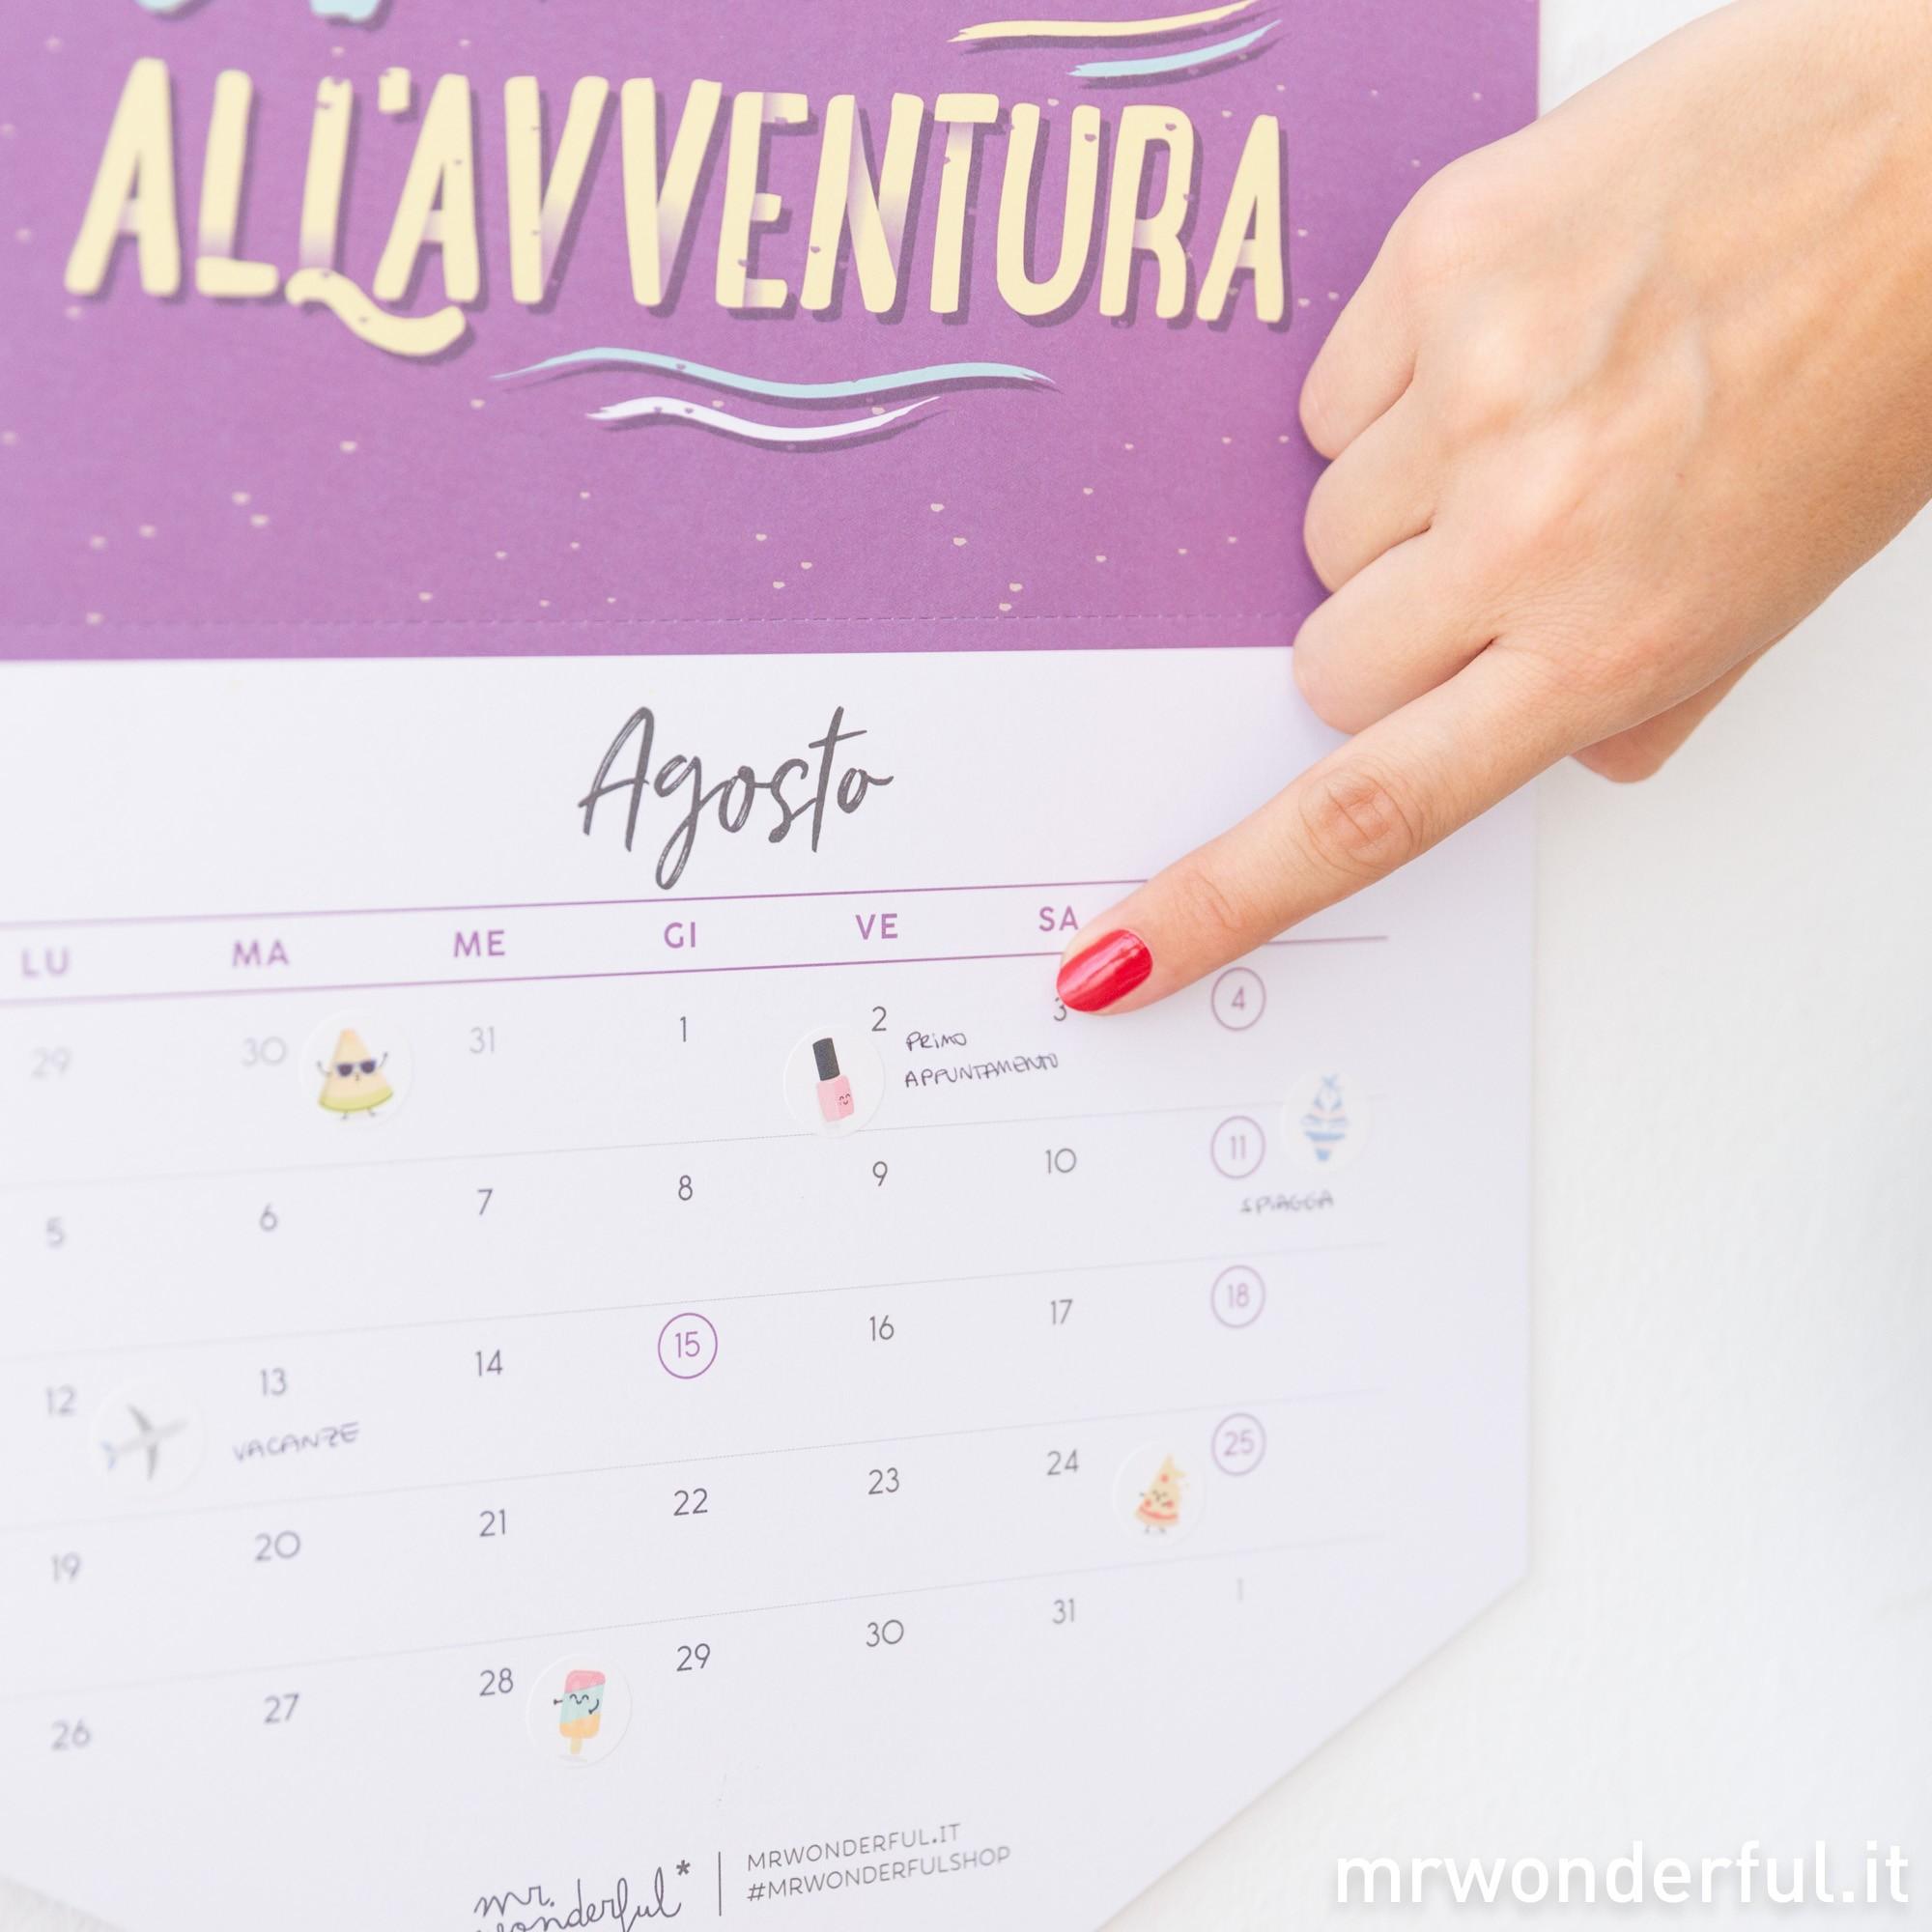 Calendario 2019 Giorni Festivi Más Populares Volta Pagina… Con Uno Dei Nostri Calendari 2019 Of Calendario 2019 Giorni Festivi Más Populares I C Viale San Marco